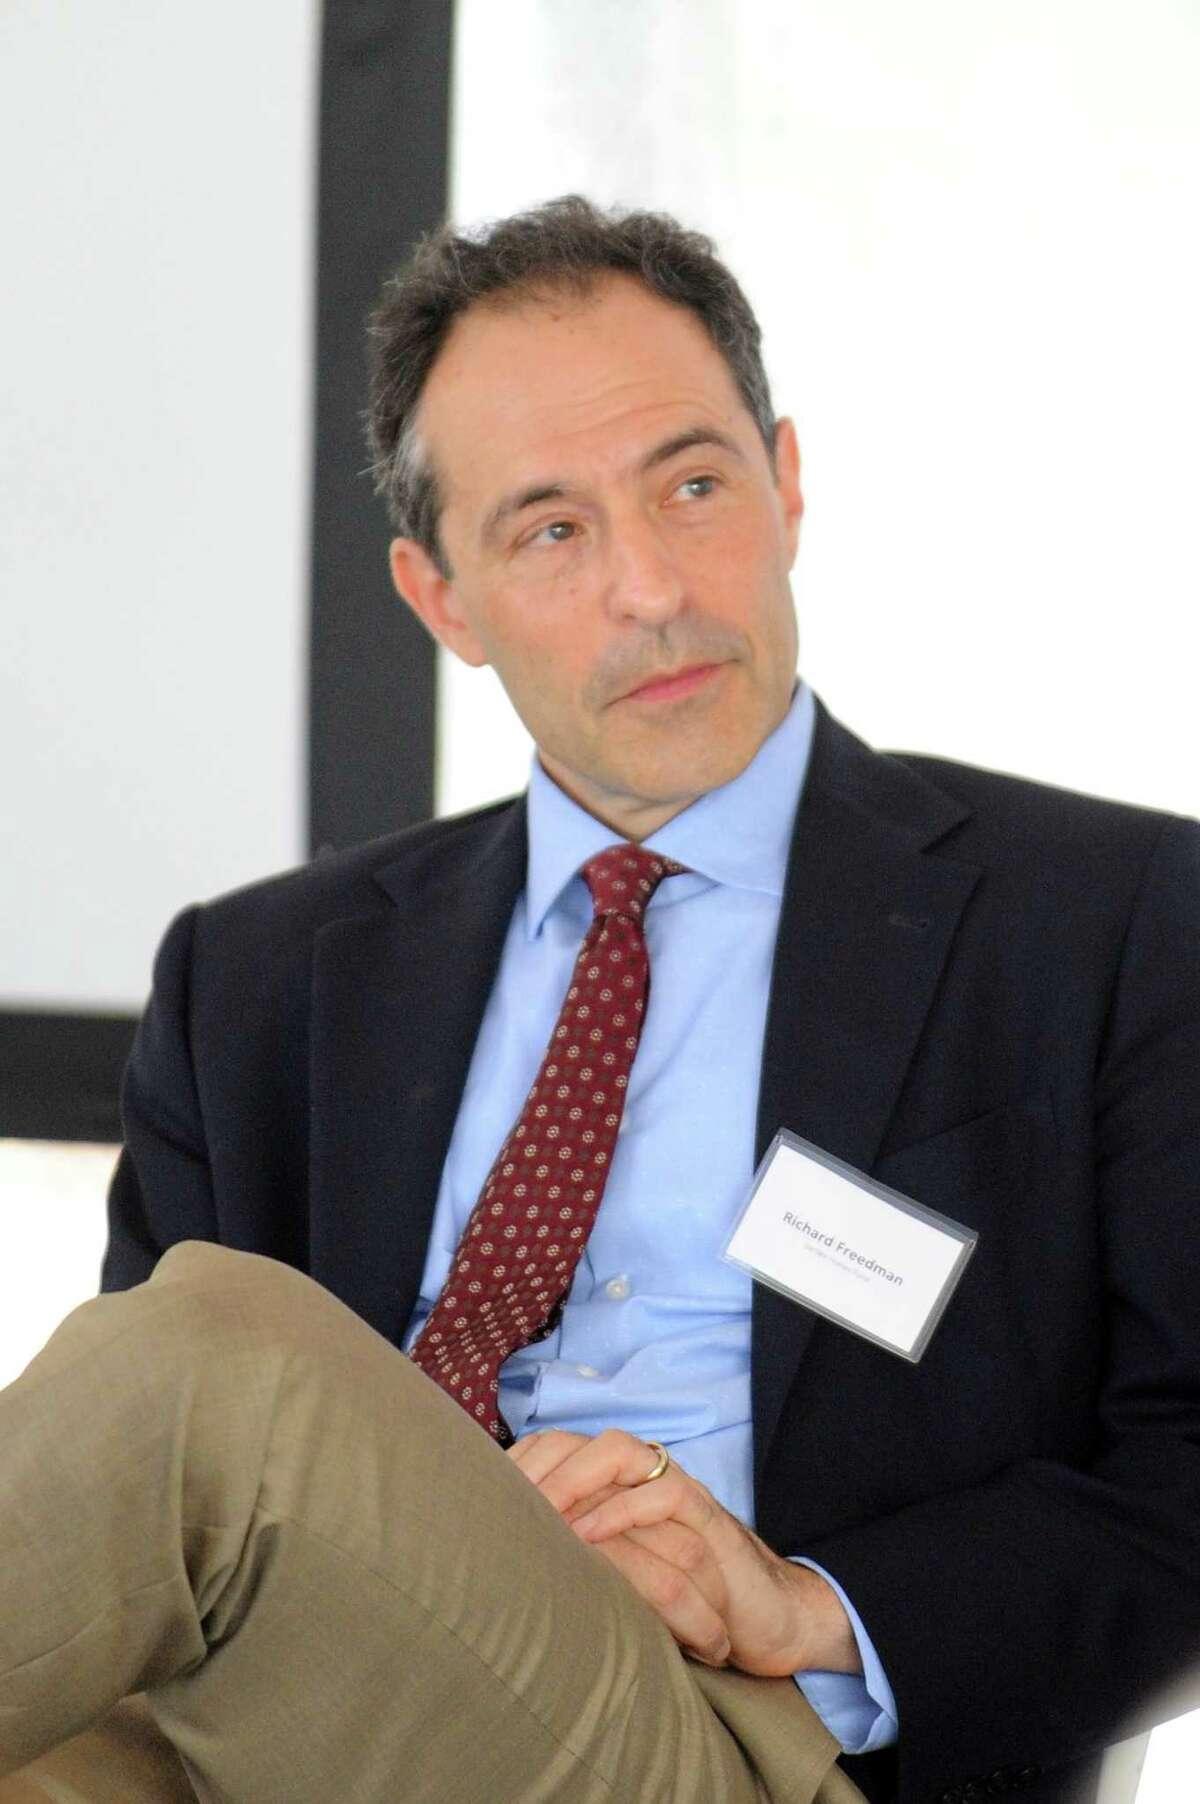 Board of Finance Chairman Richard Freedman